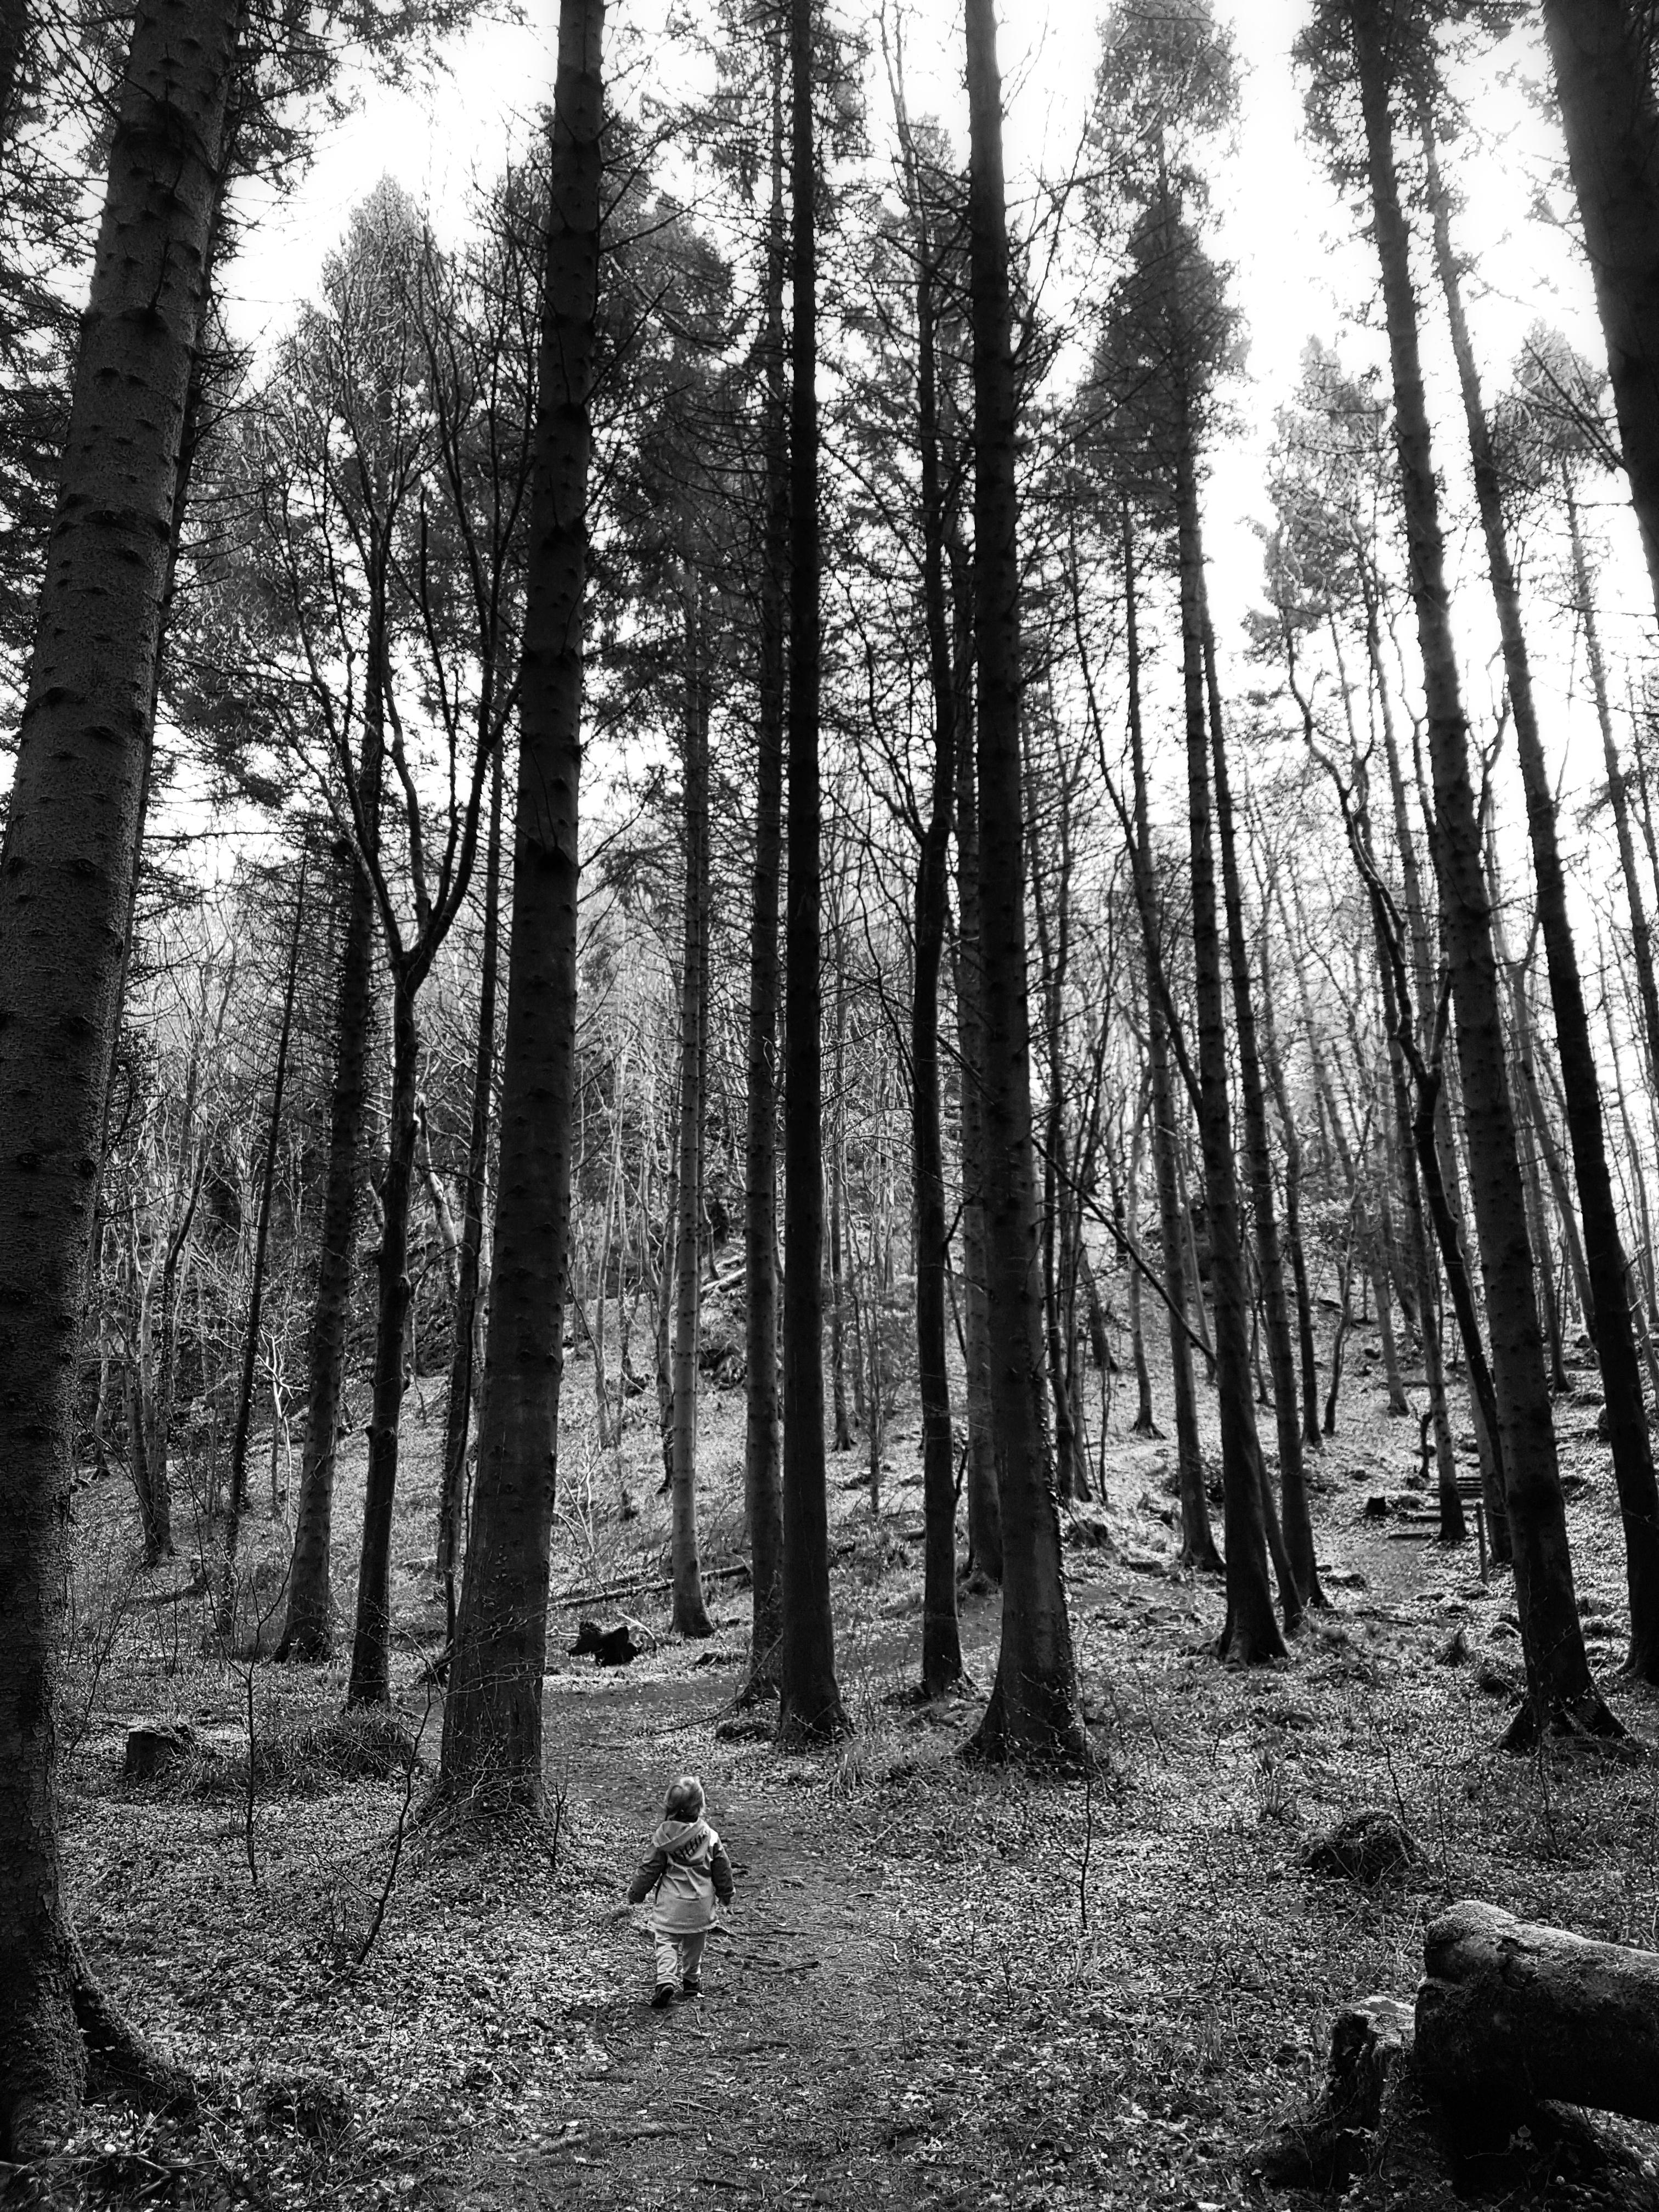 Kid wandering through the woods